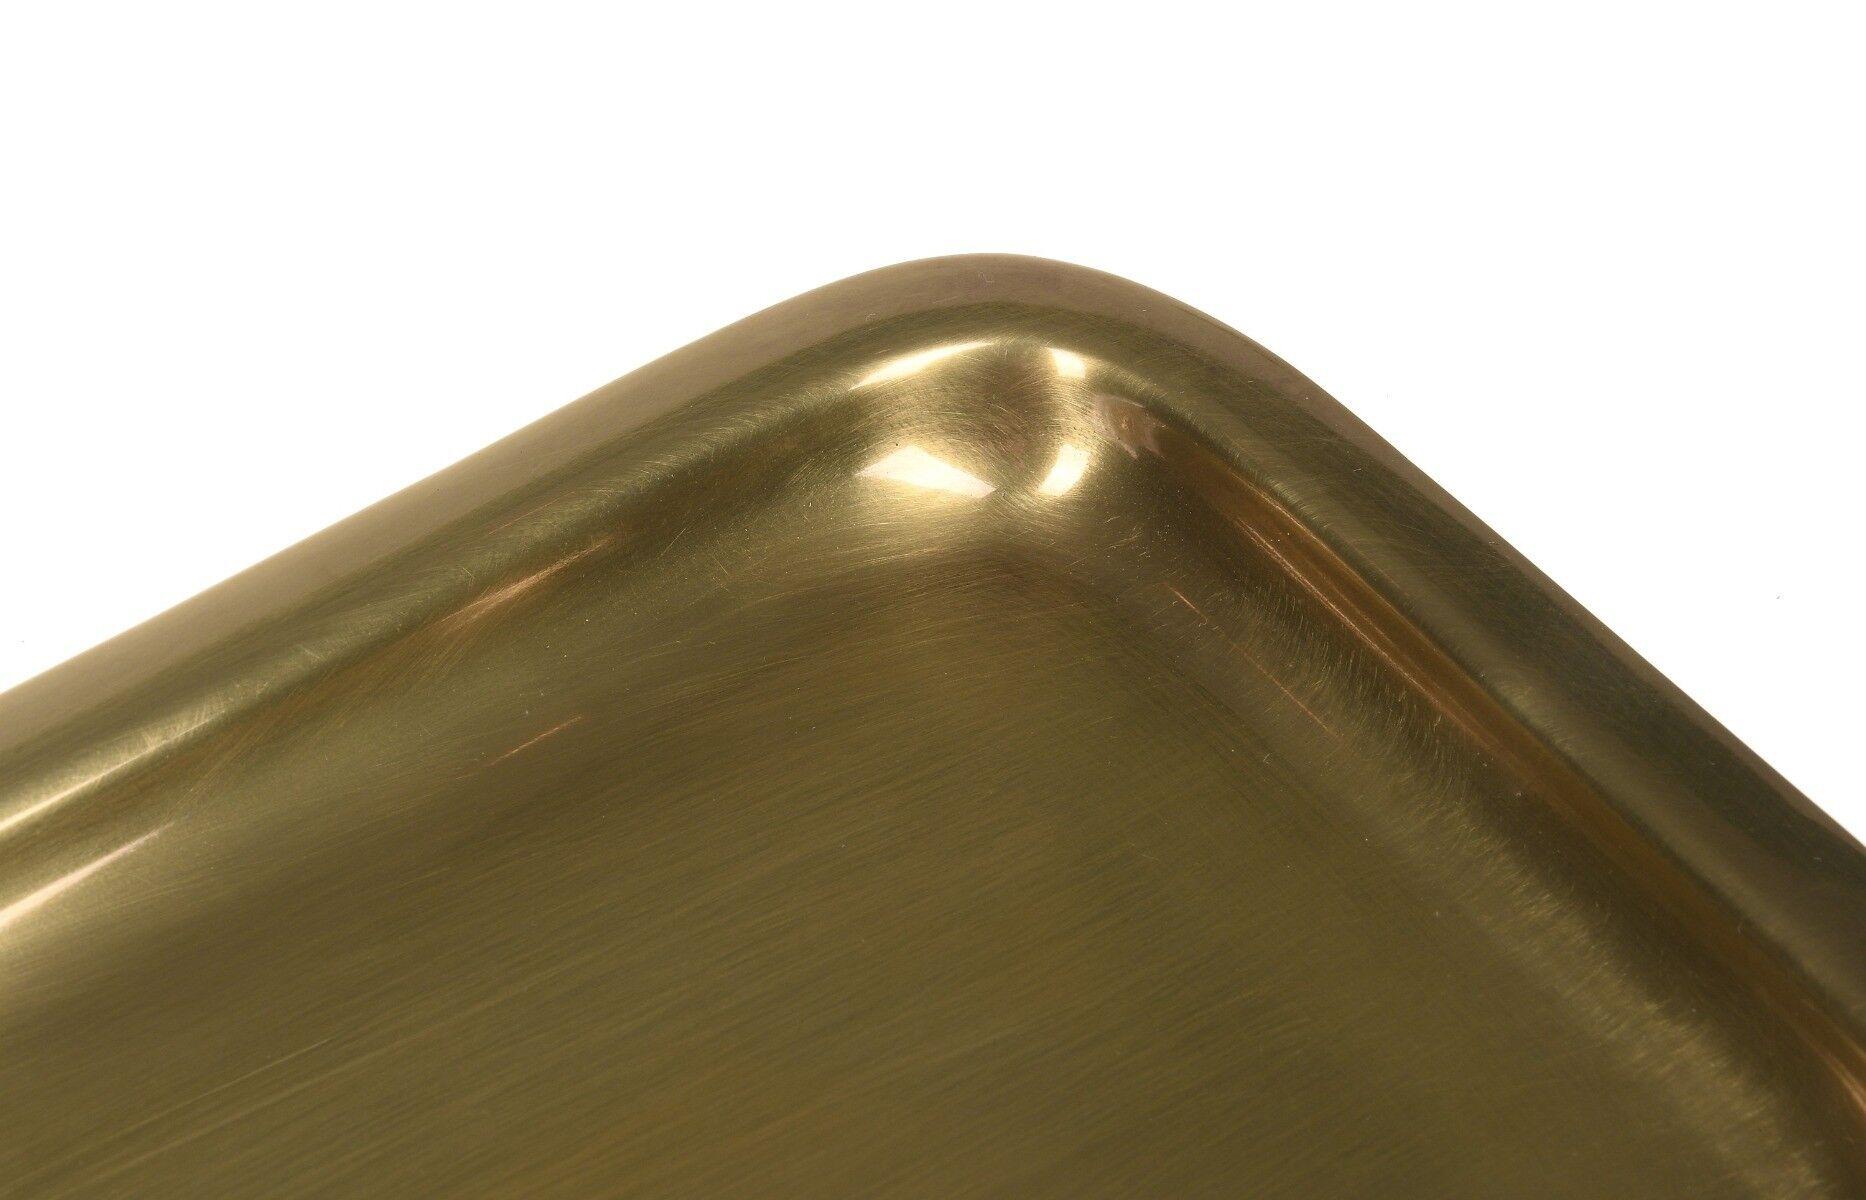 Taca Florance Brass 30x15x1 cm